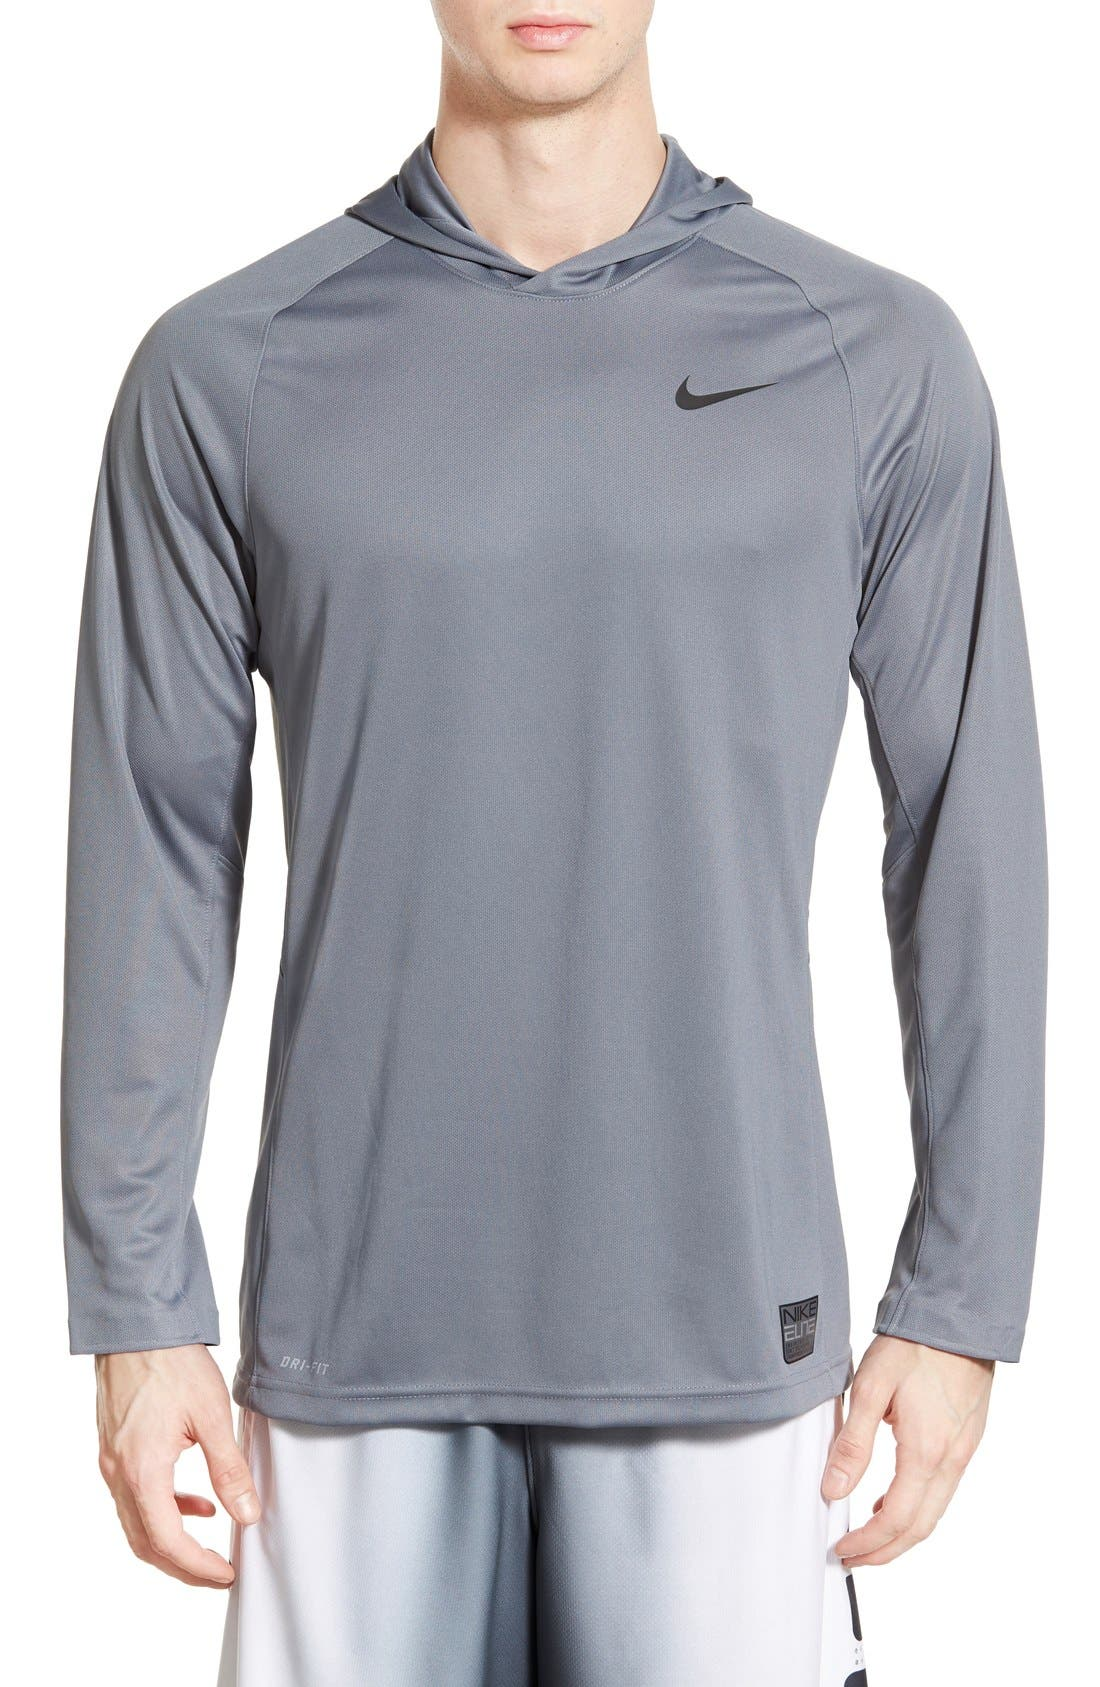 Alternate Image 1 Selected - Nike 'Elite Shooter - Dri-FIT' Long Sleeve Hooded Basketball Shirt